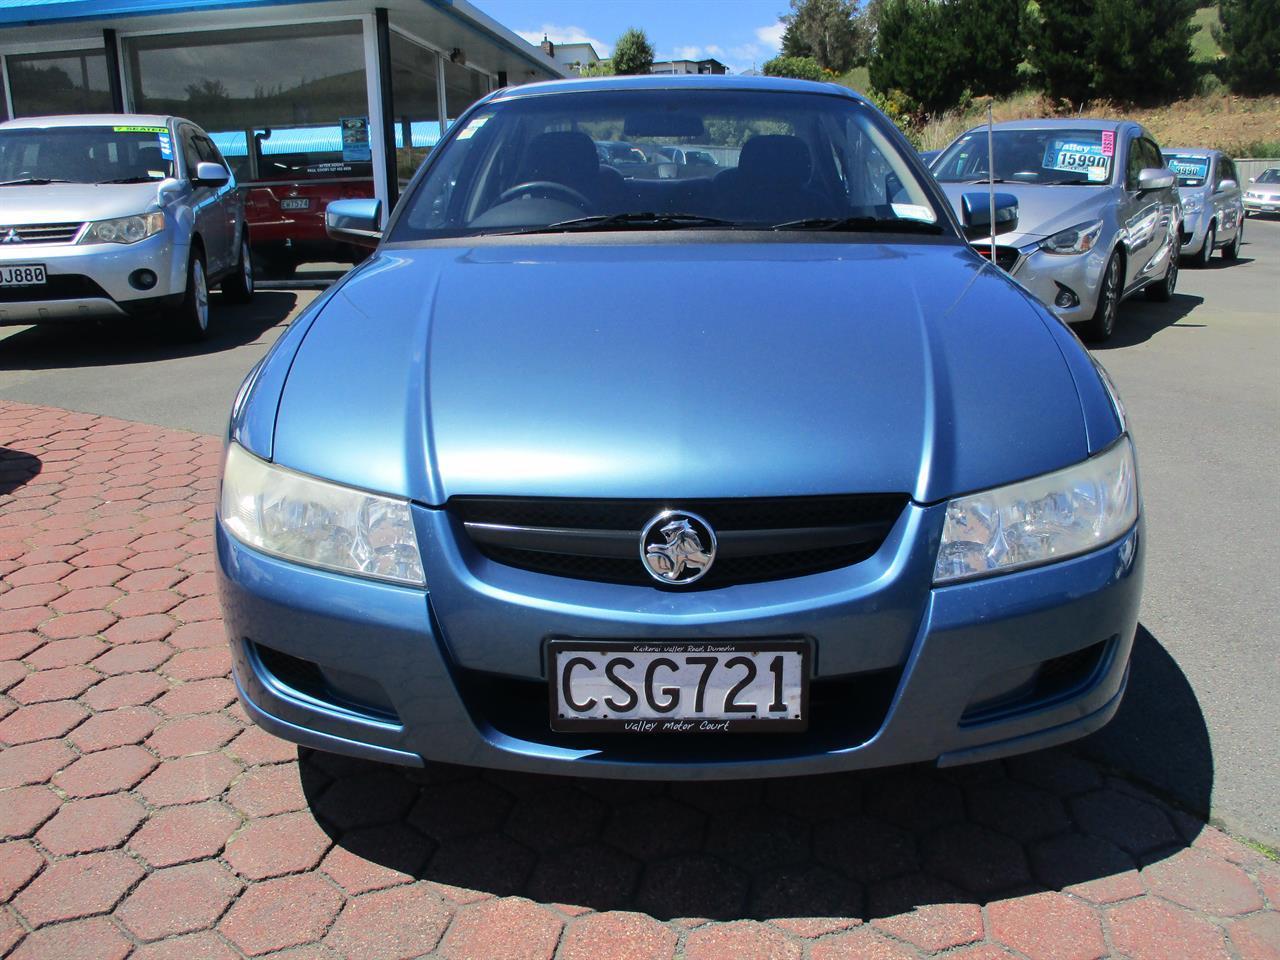 image-8, 2005 Holden Commodore VZ Acclaim at Dunedin